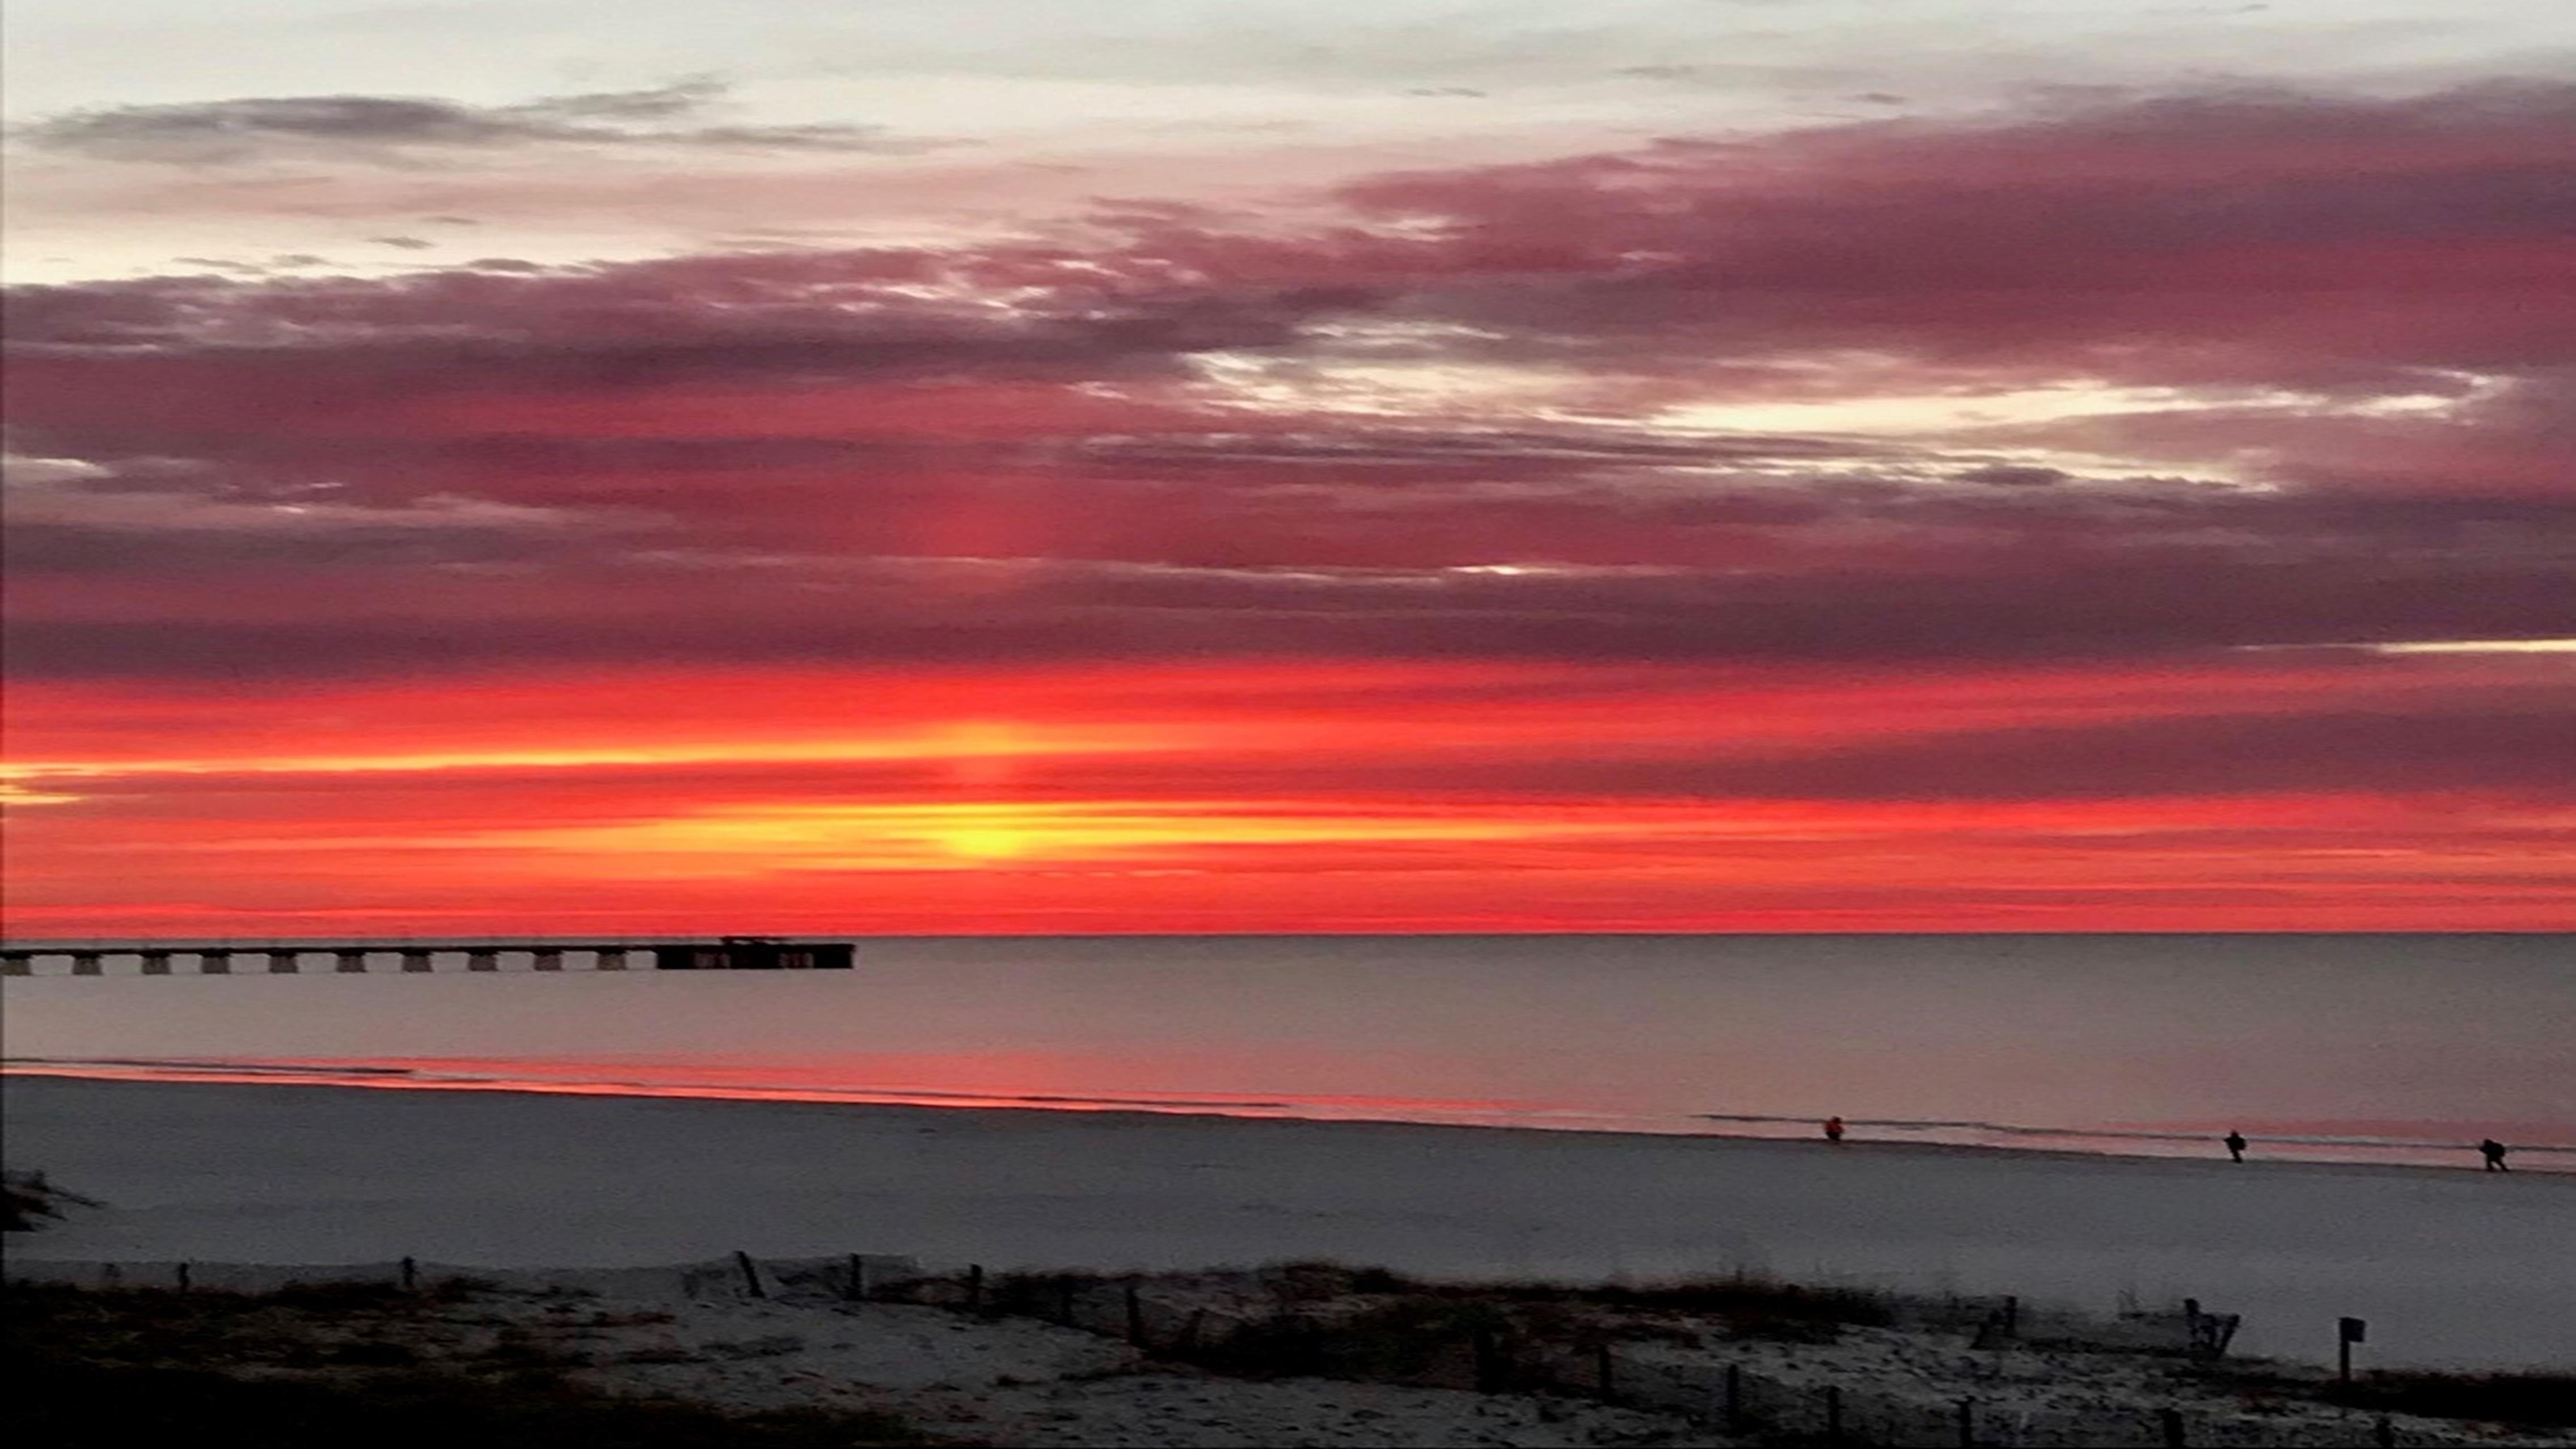 Sunrise over Gulf State Park Pier